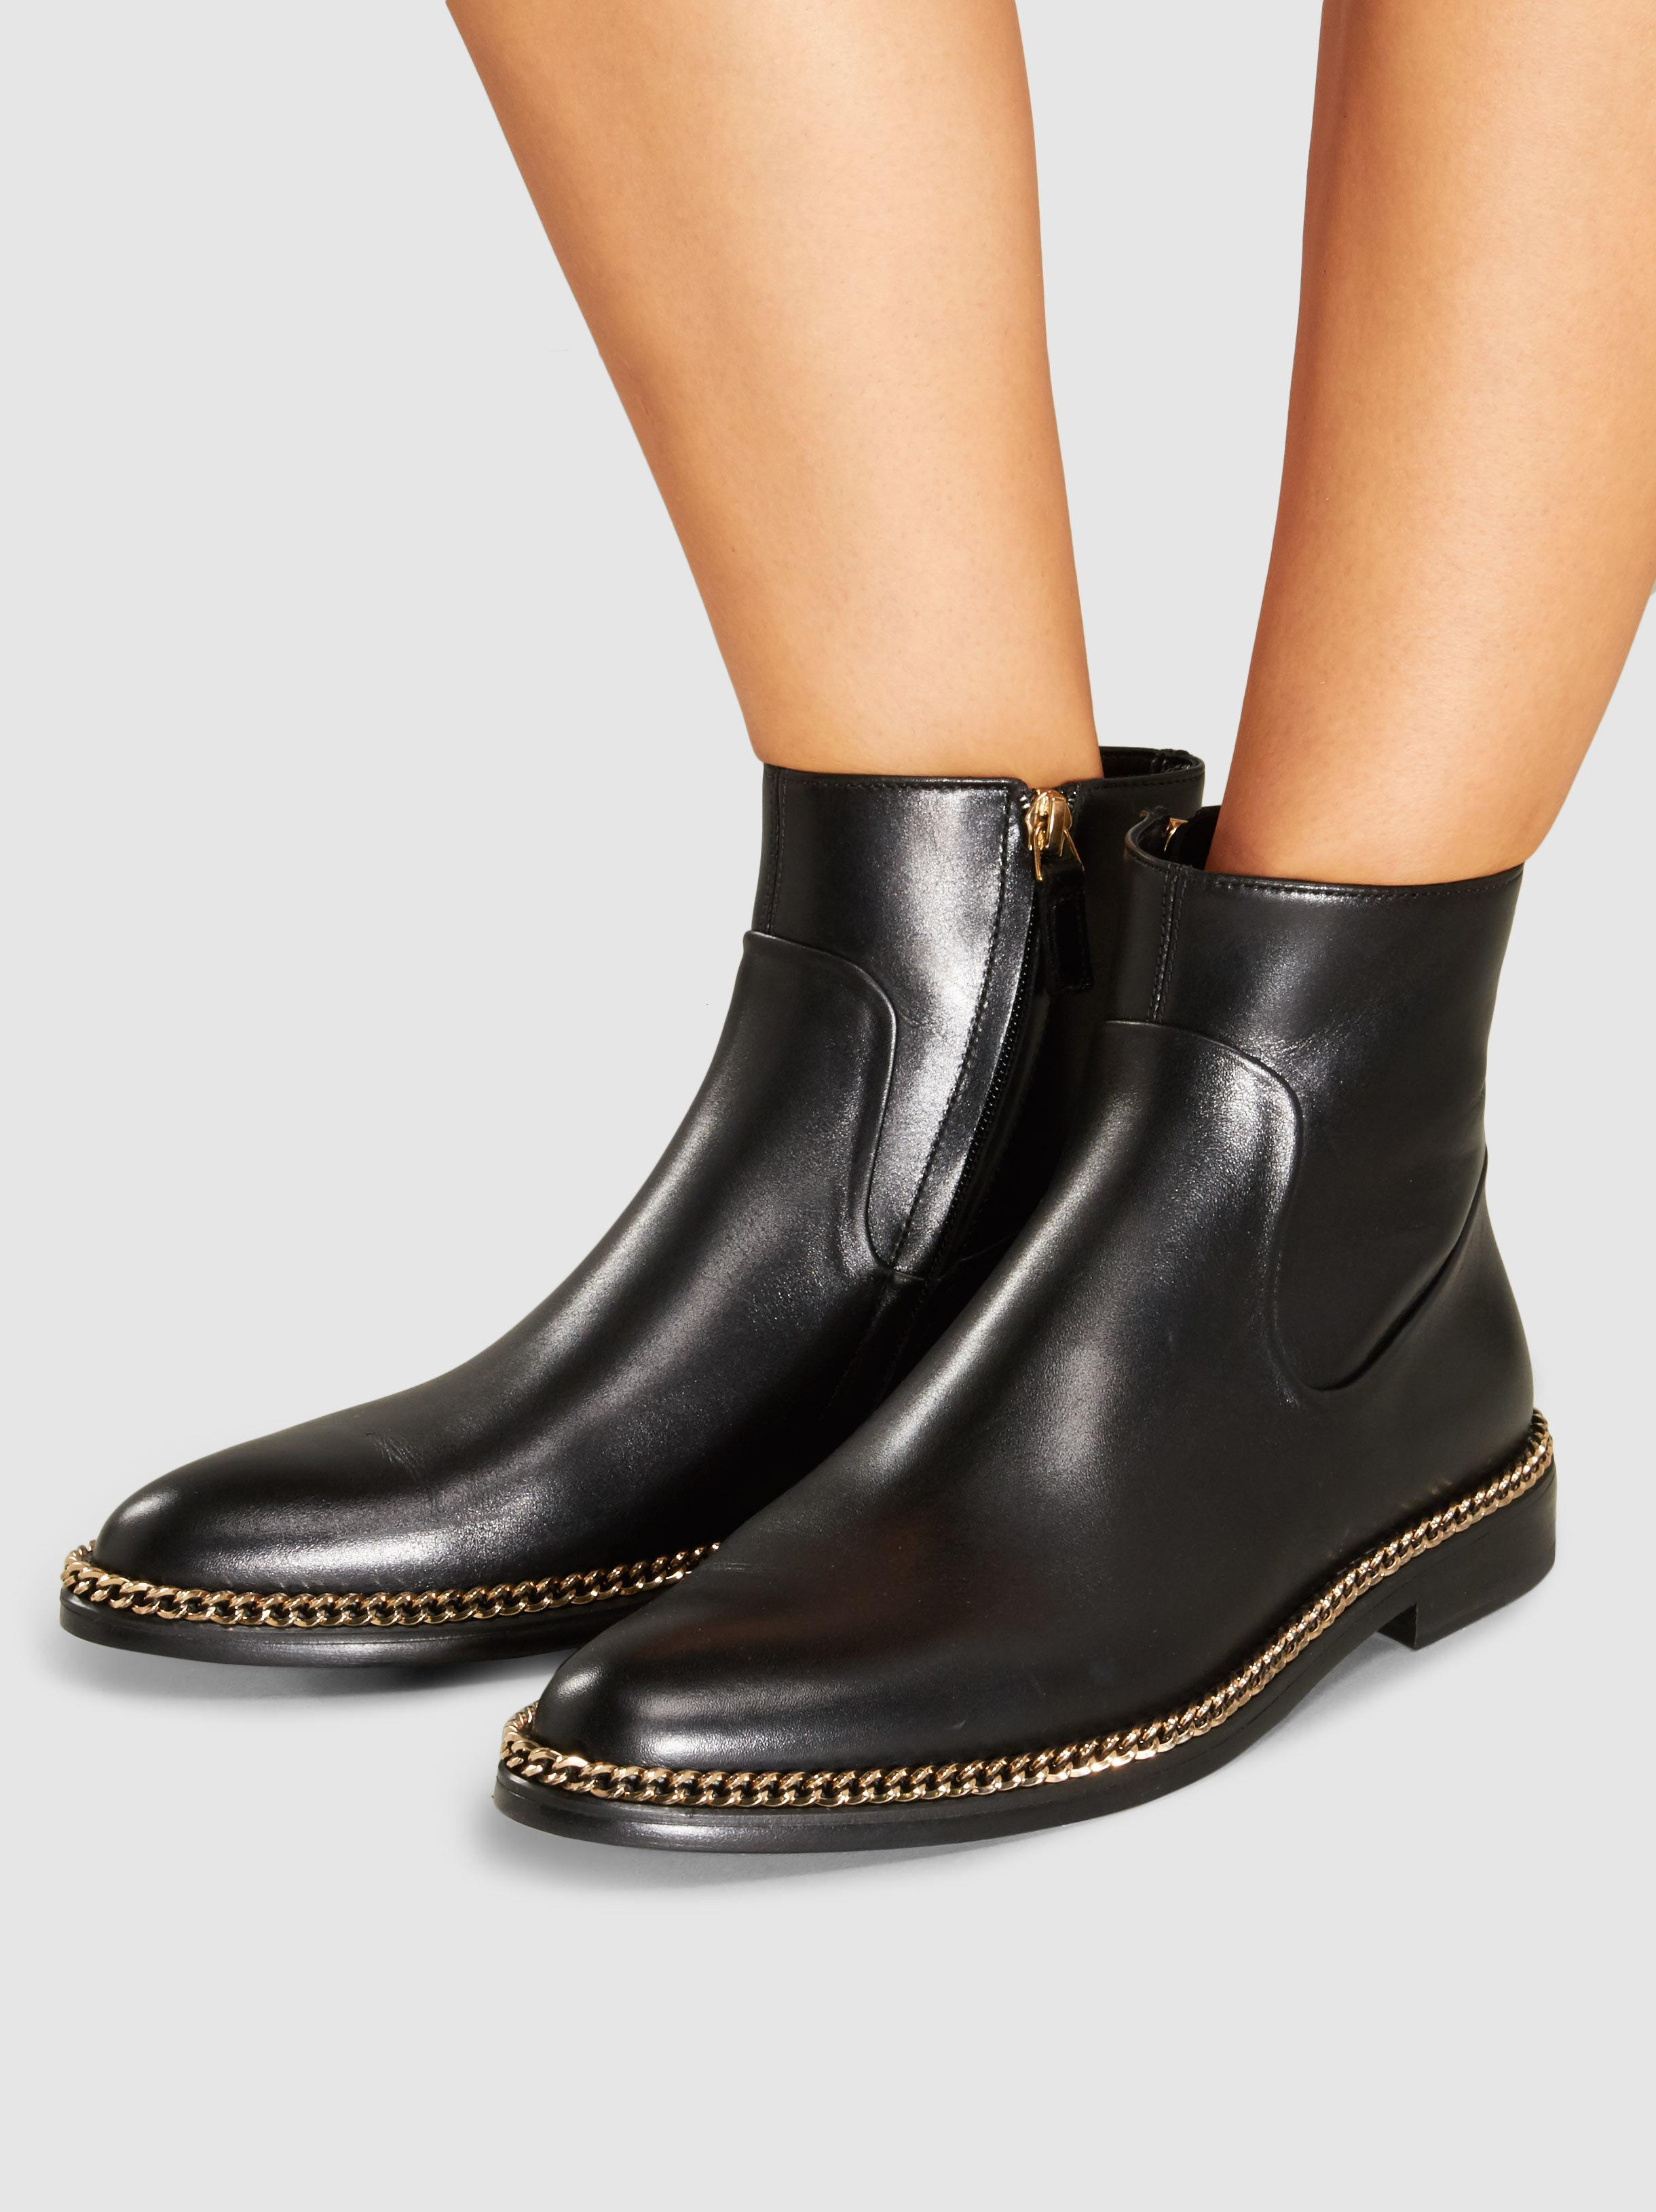 Lanvin Leather Chain-Link Ankle Boots shop cheap online sale 100% authentic buy cheap the cheapest RakvCEvG6